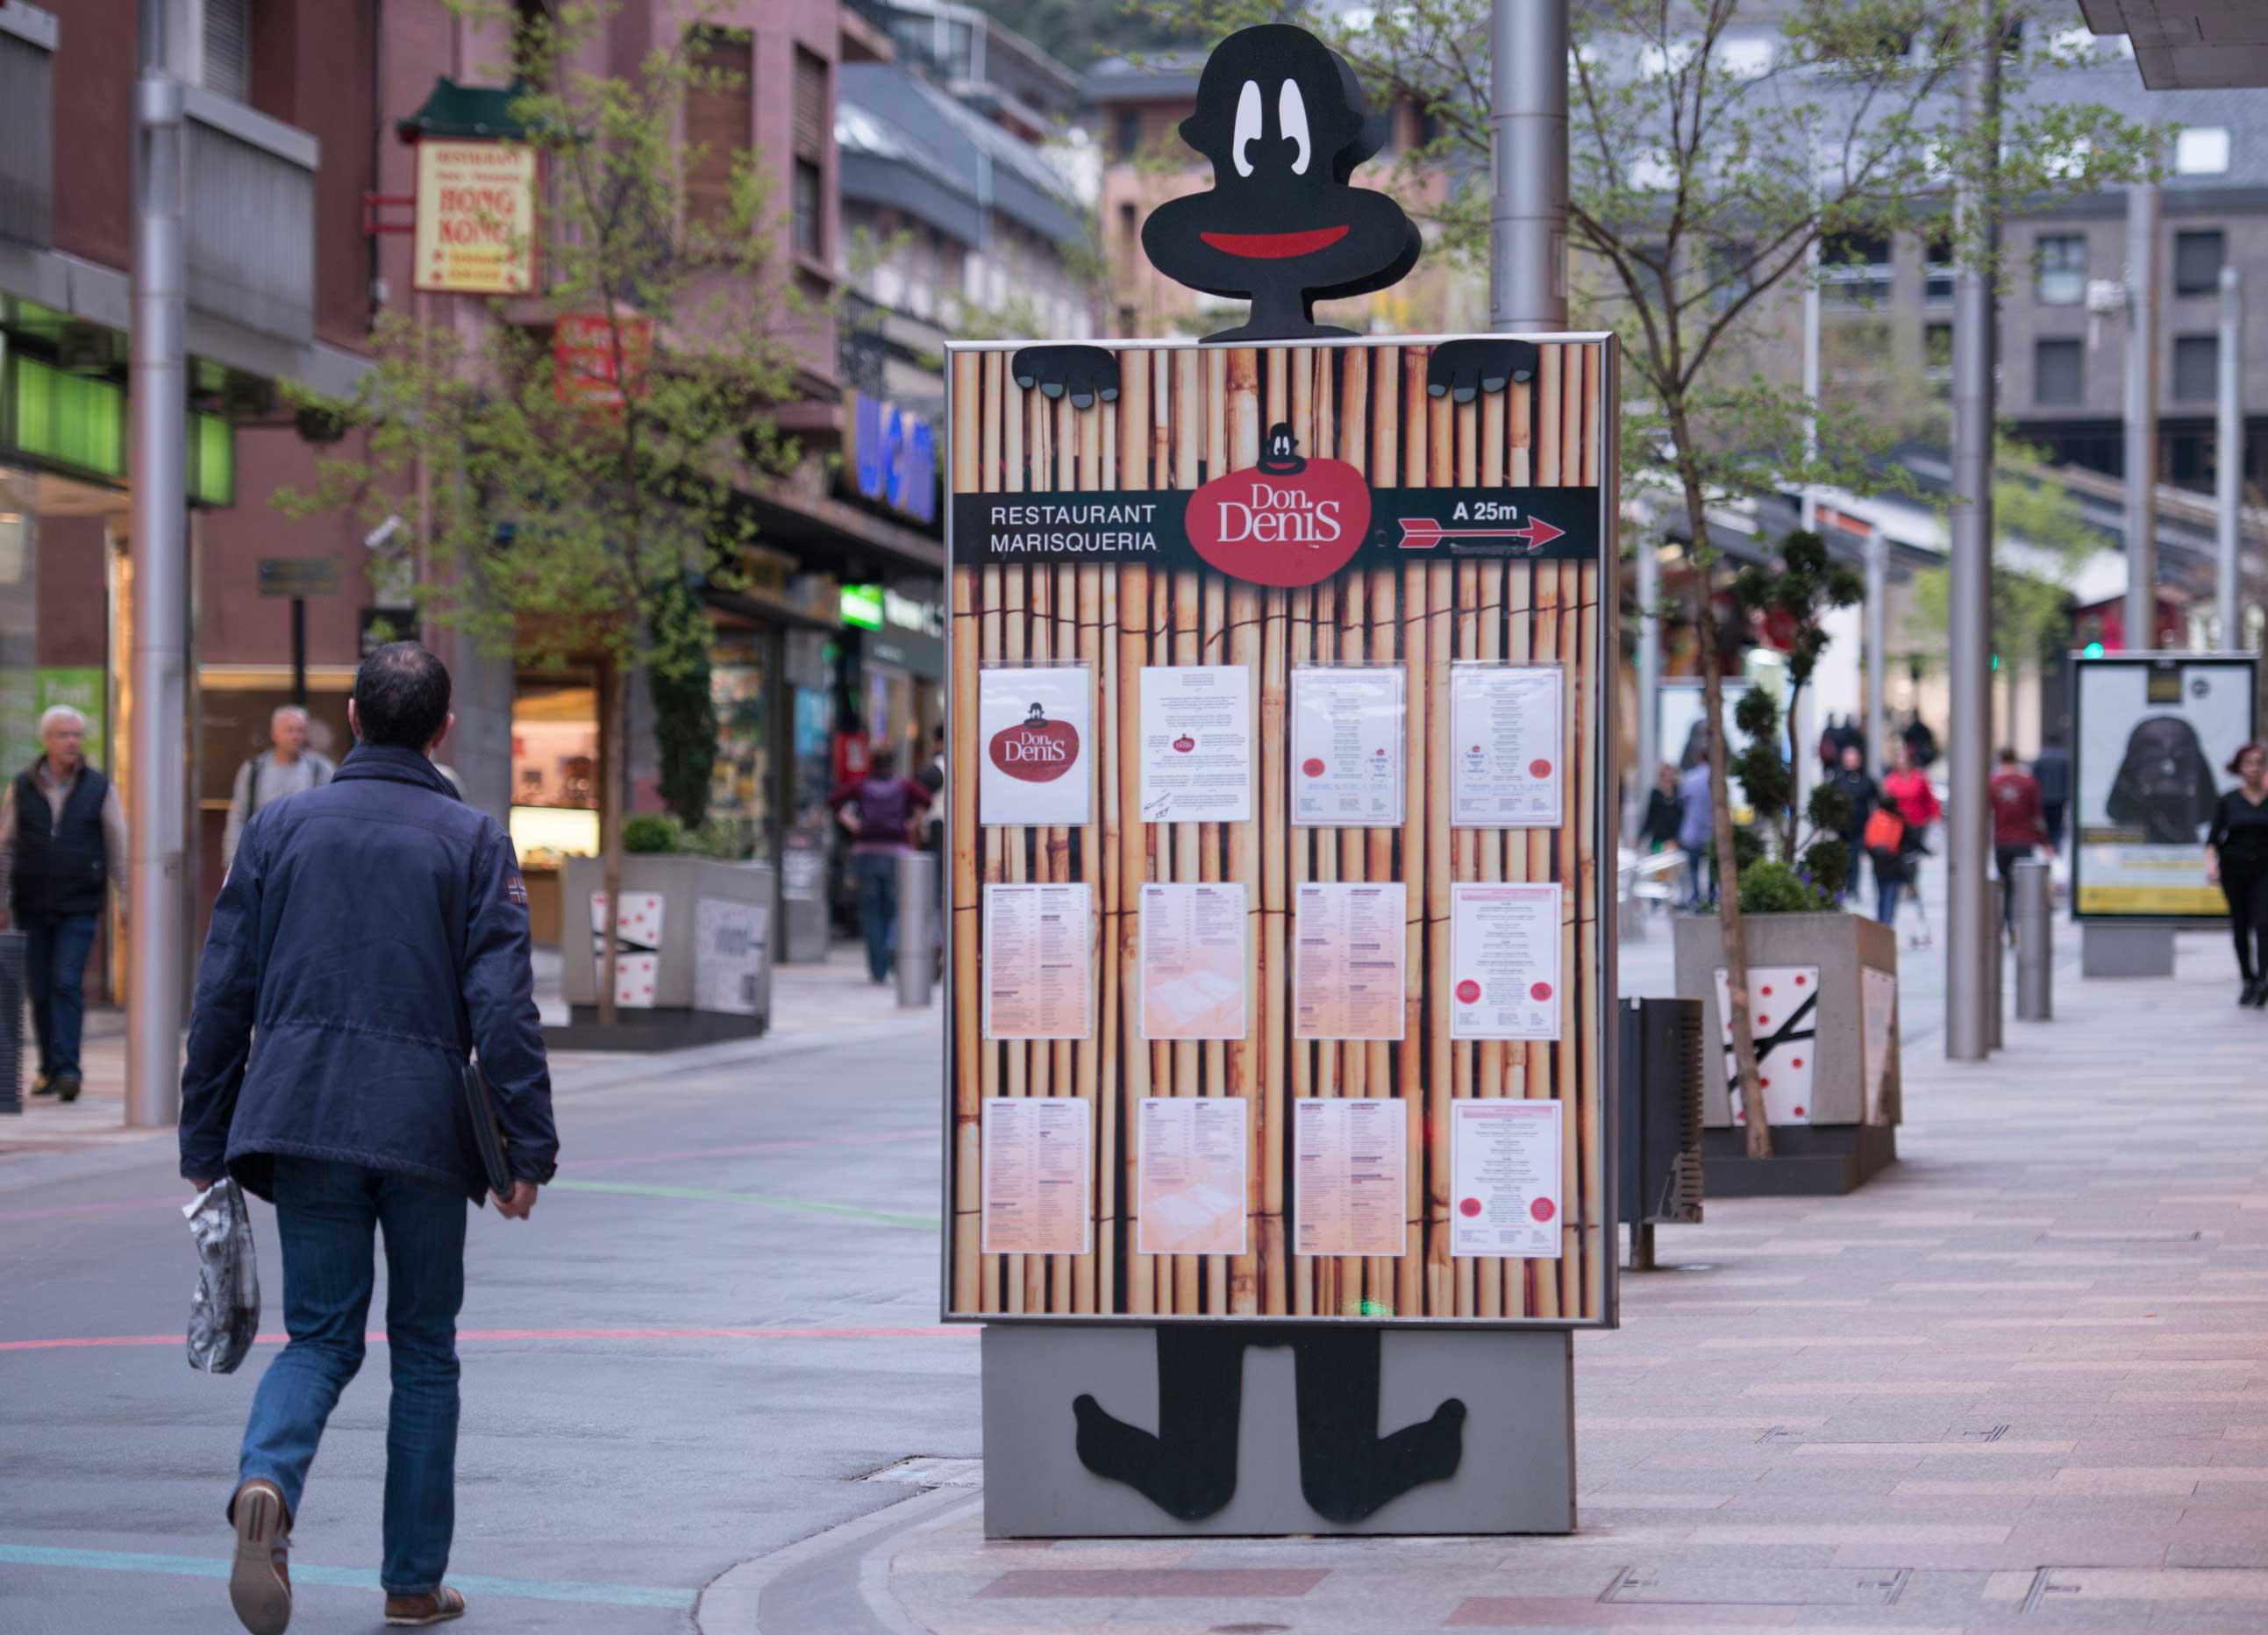 mobiliario-urbano-oppi-publicidad-exterior-don-denis-andorra-vsa-comunicacion